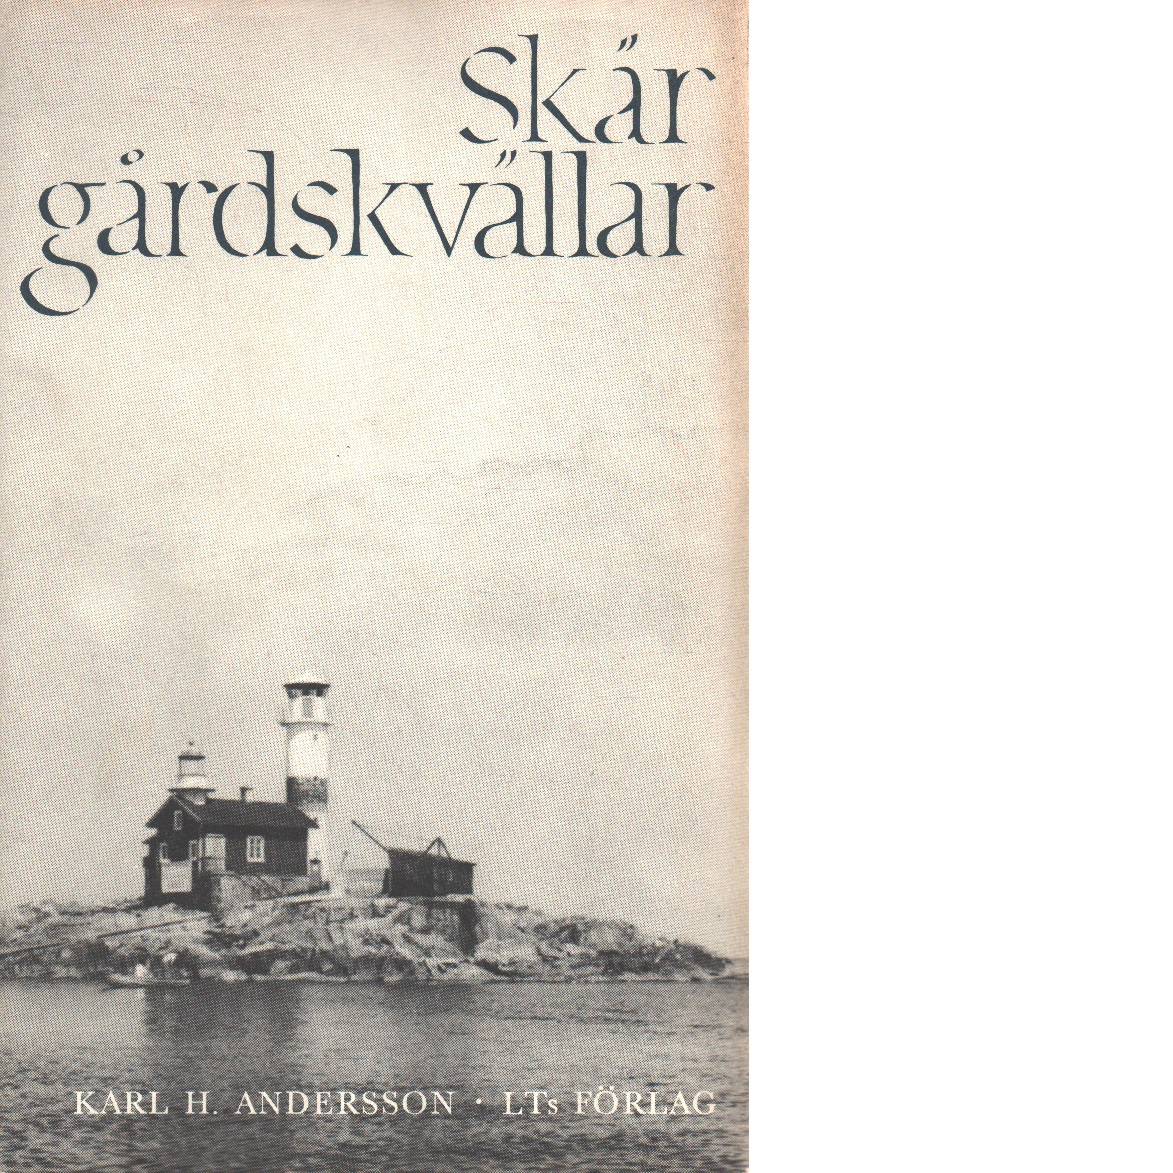 Skärgårdskvällar. - Andersson, Karl H.